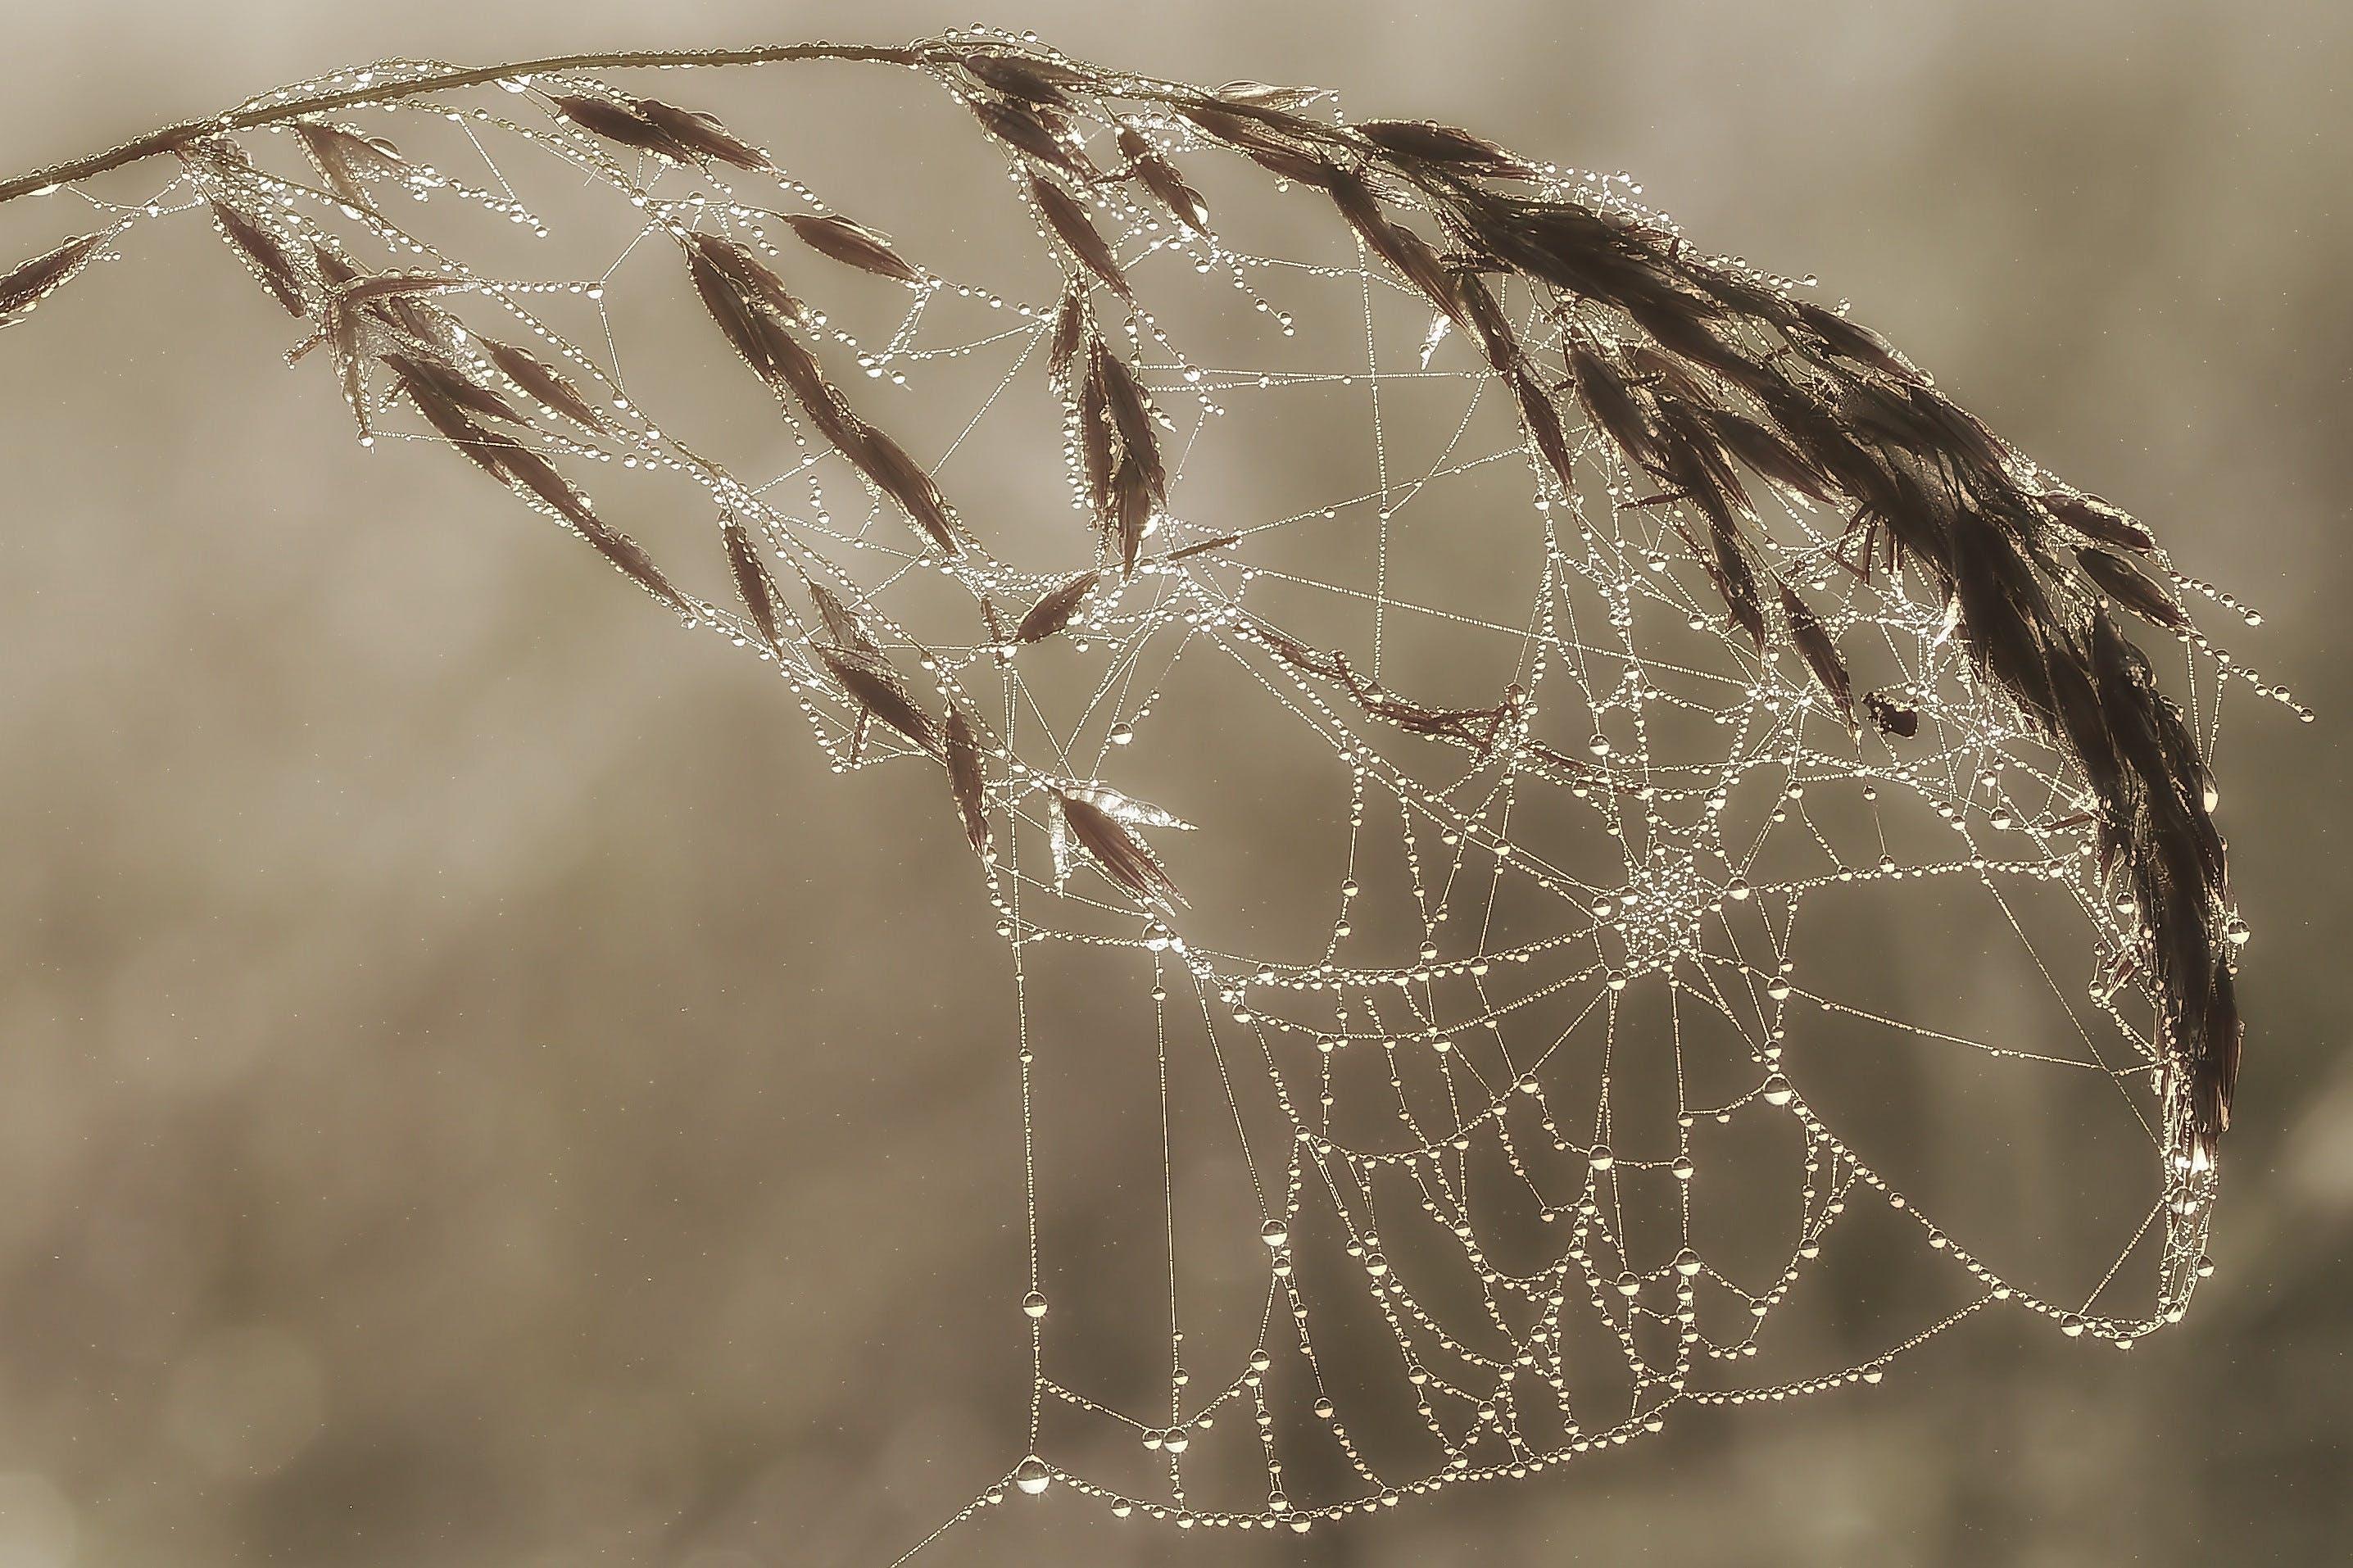 Spider Web on Wheat